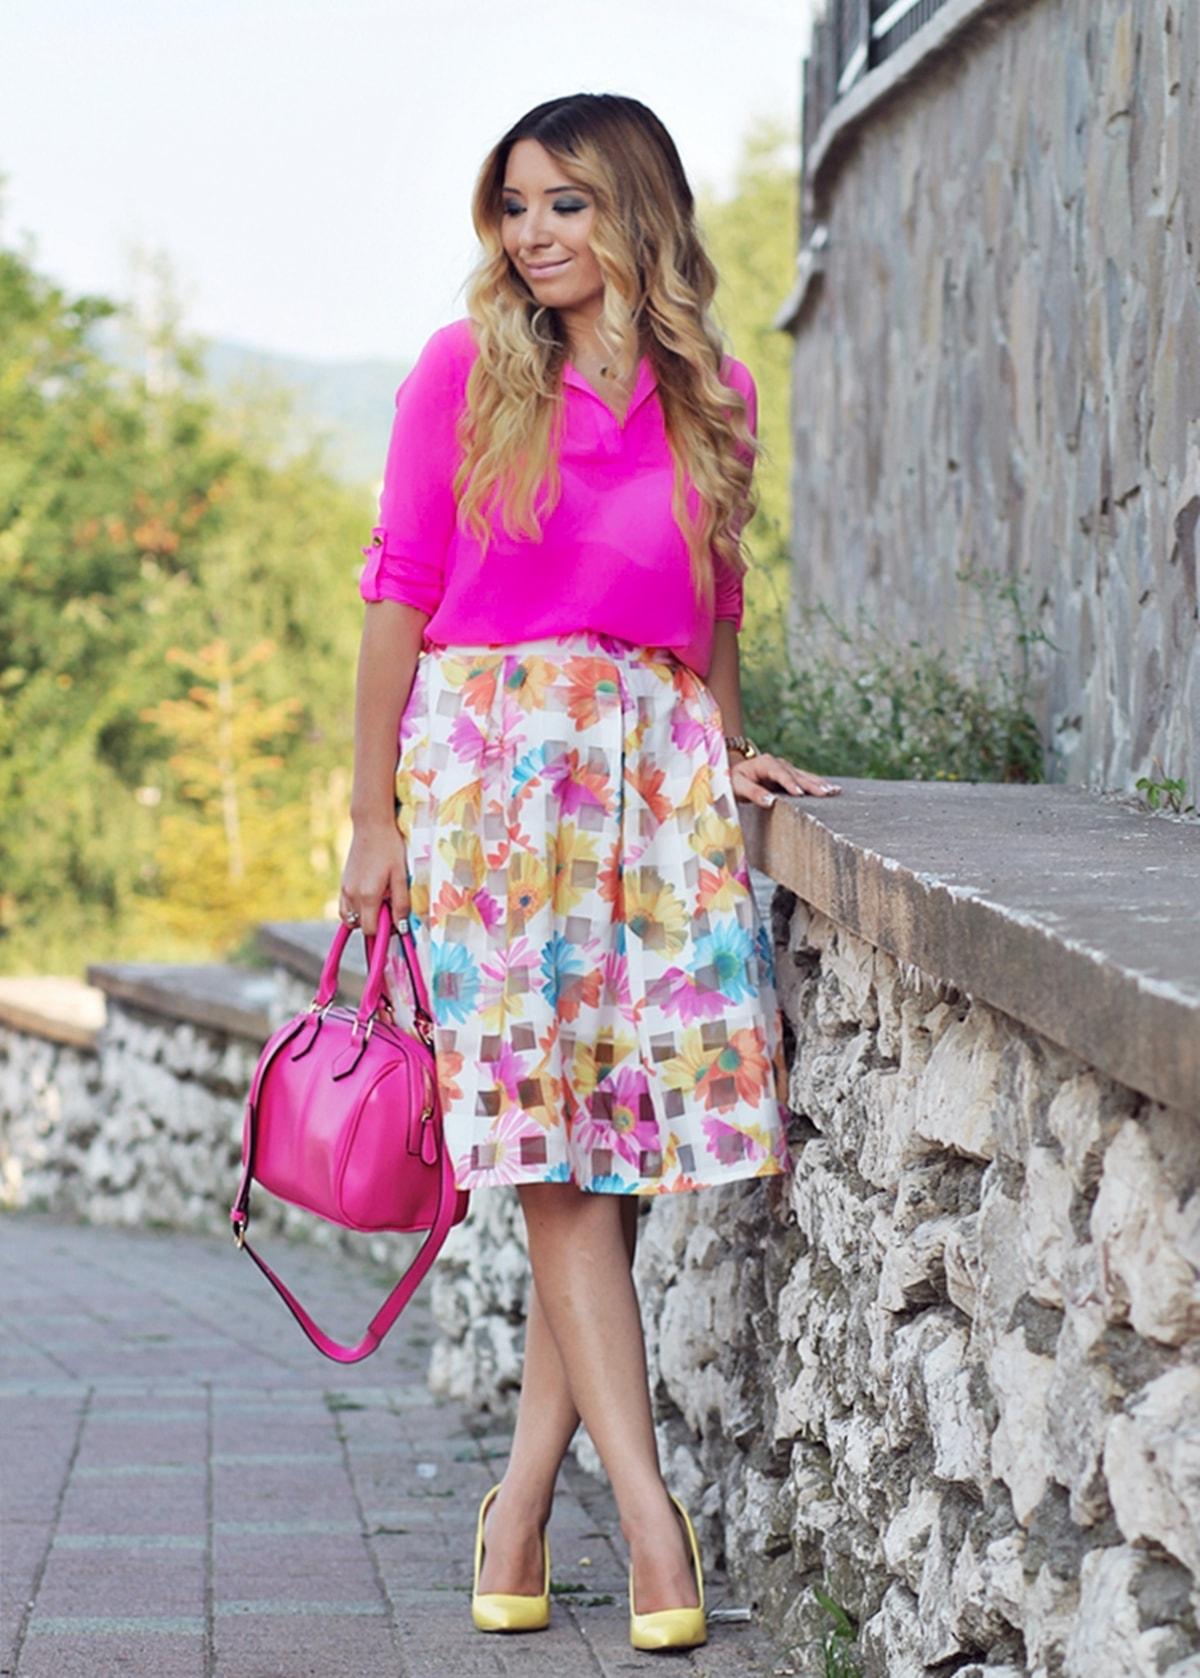 Street style: neon pink shirt, floral print skirt, pink bag, yellow high heels, andreea ristea